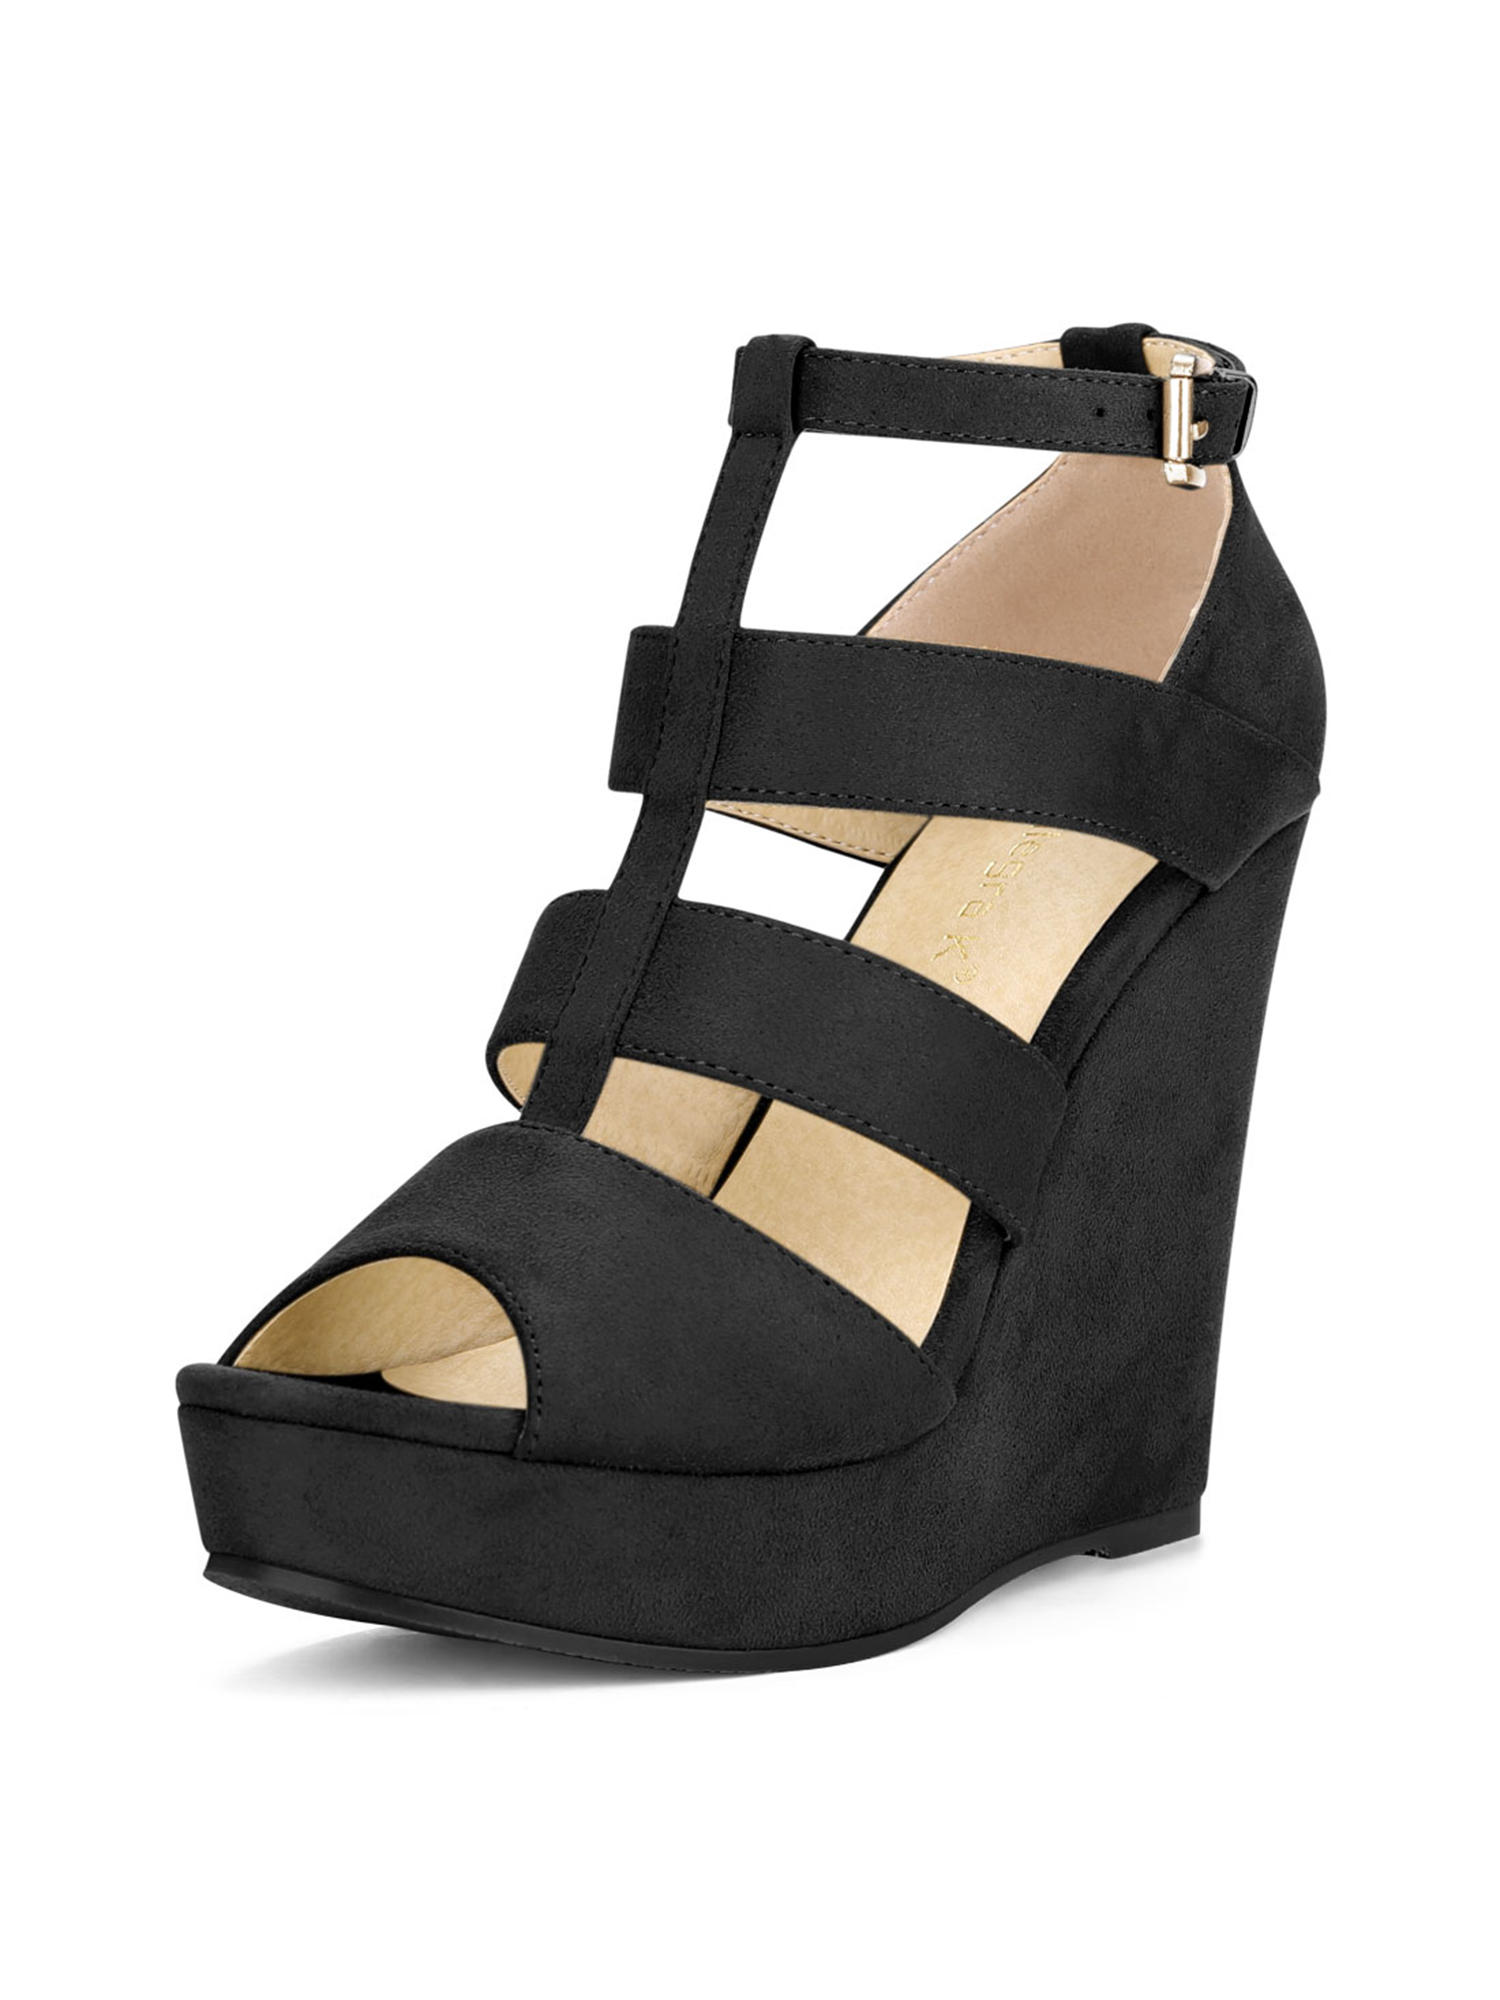 17436eaa2c7c Unique Bargains Women s High Platform Peep Toe Cutout Wedge ...